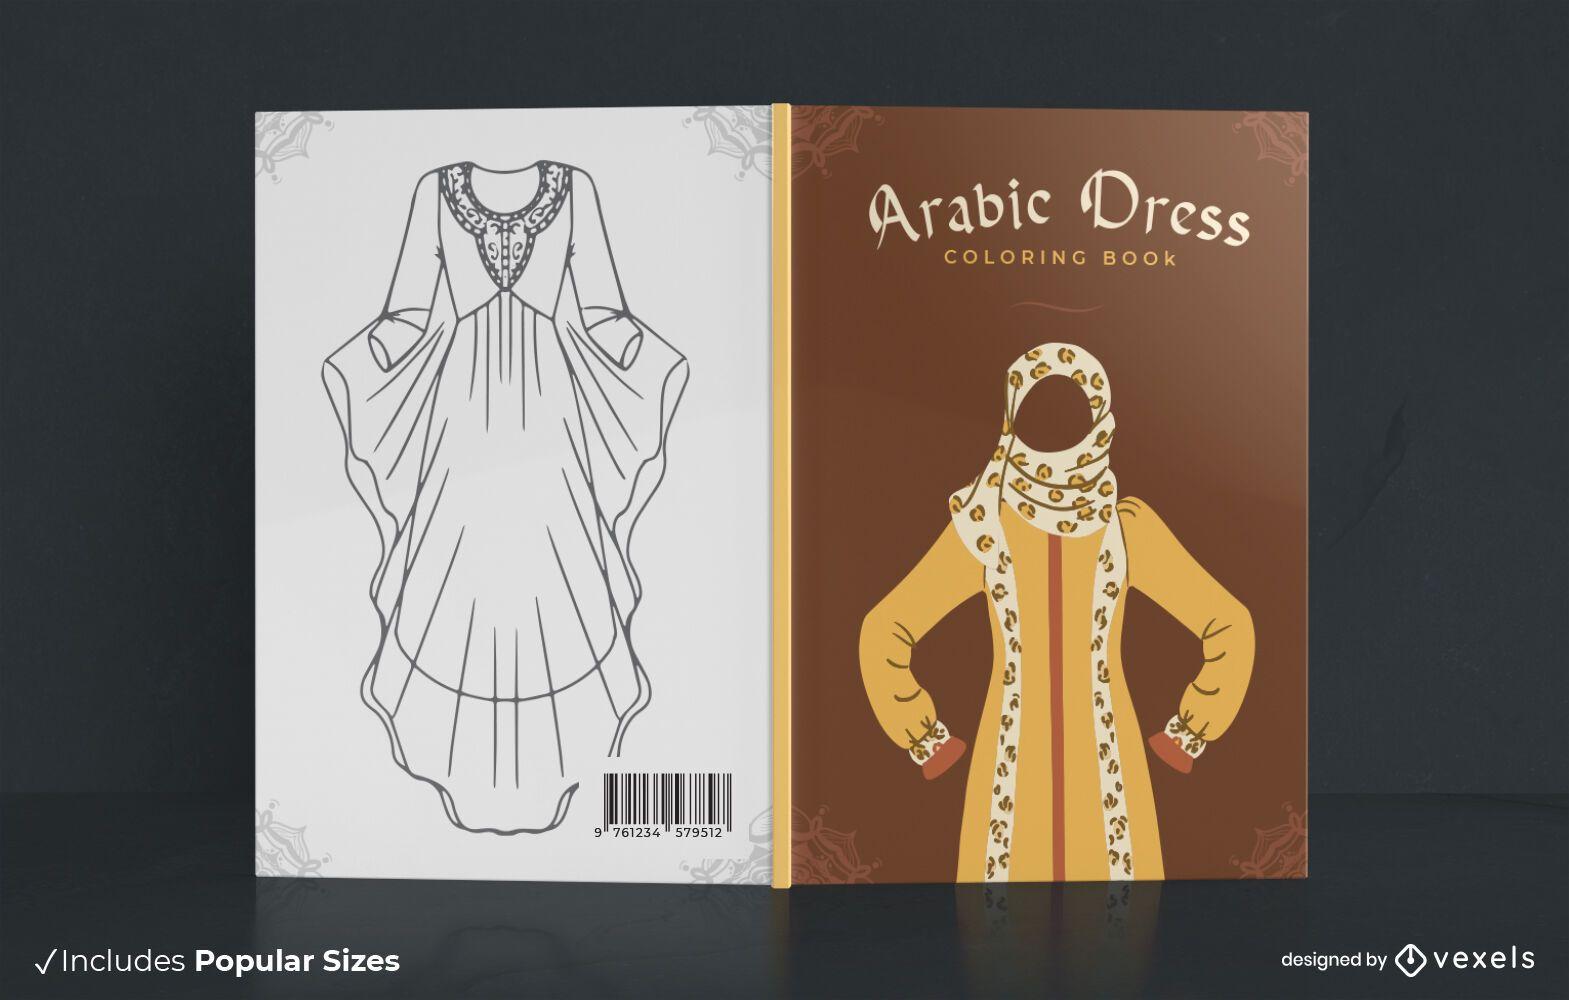 Arabic dress coloring book cover design